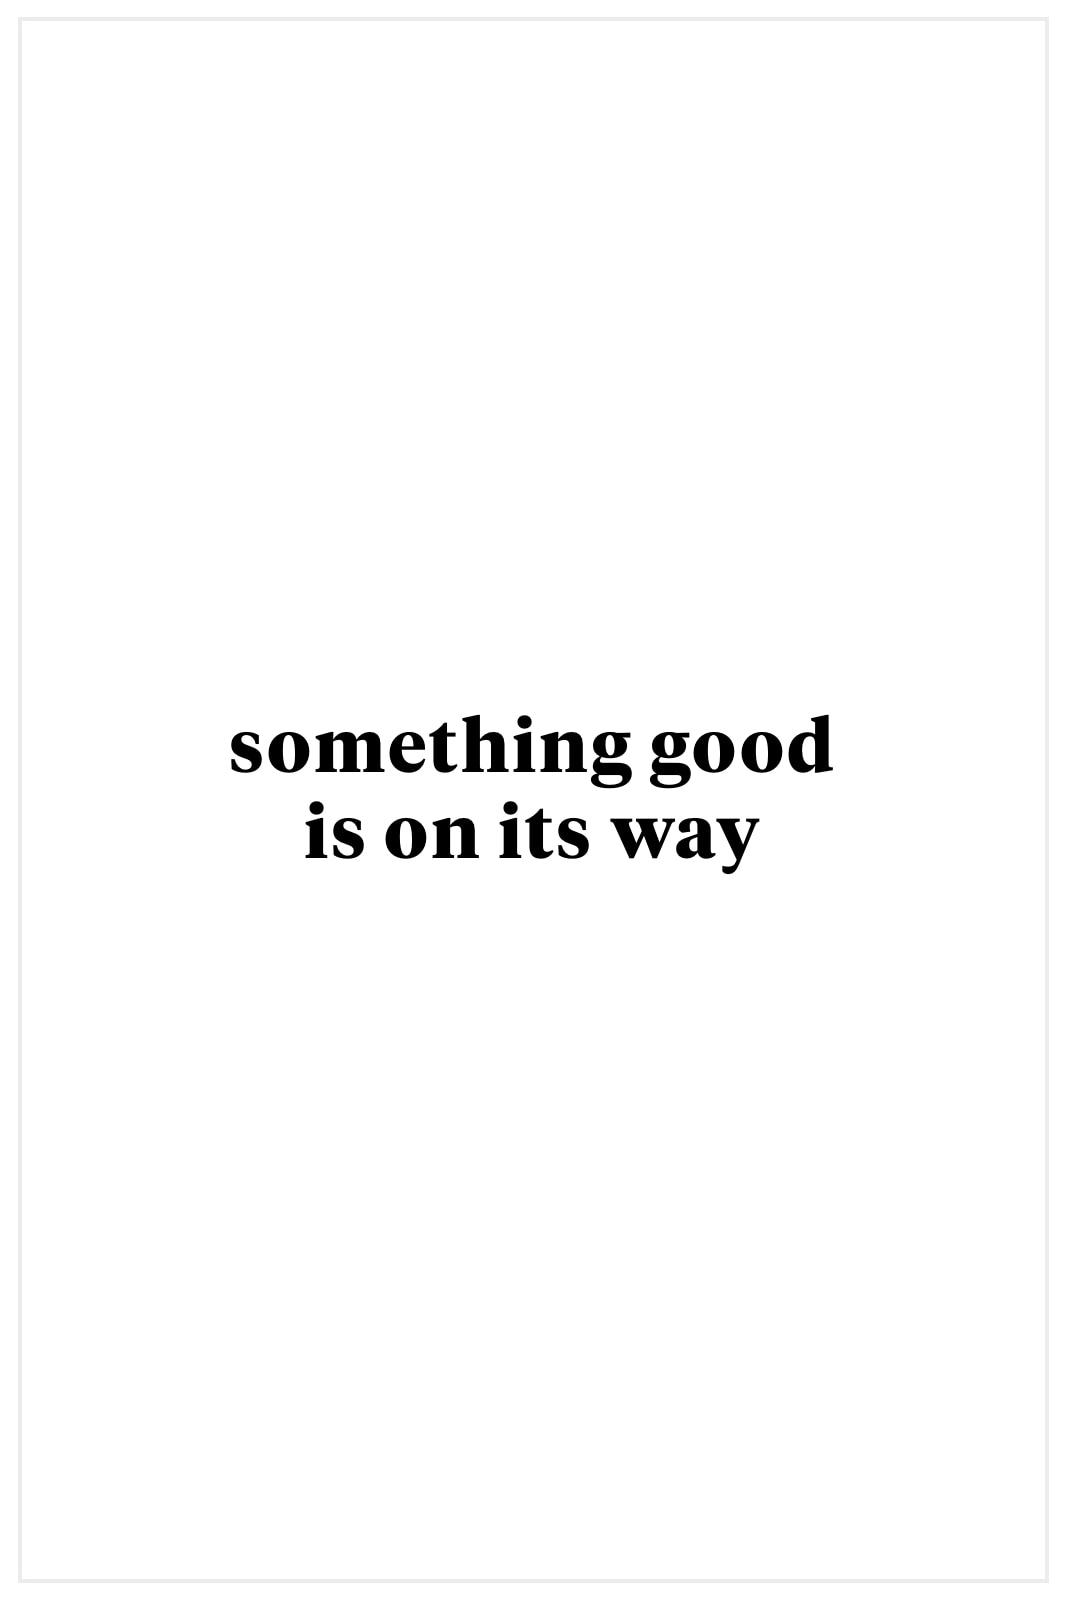 Tori Paperclip Chain Necklace